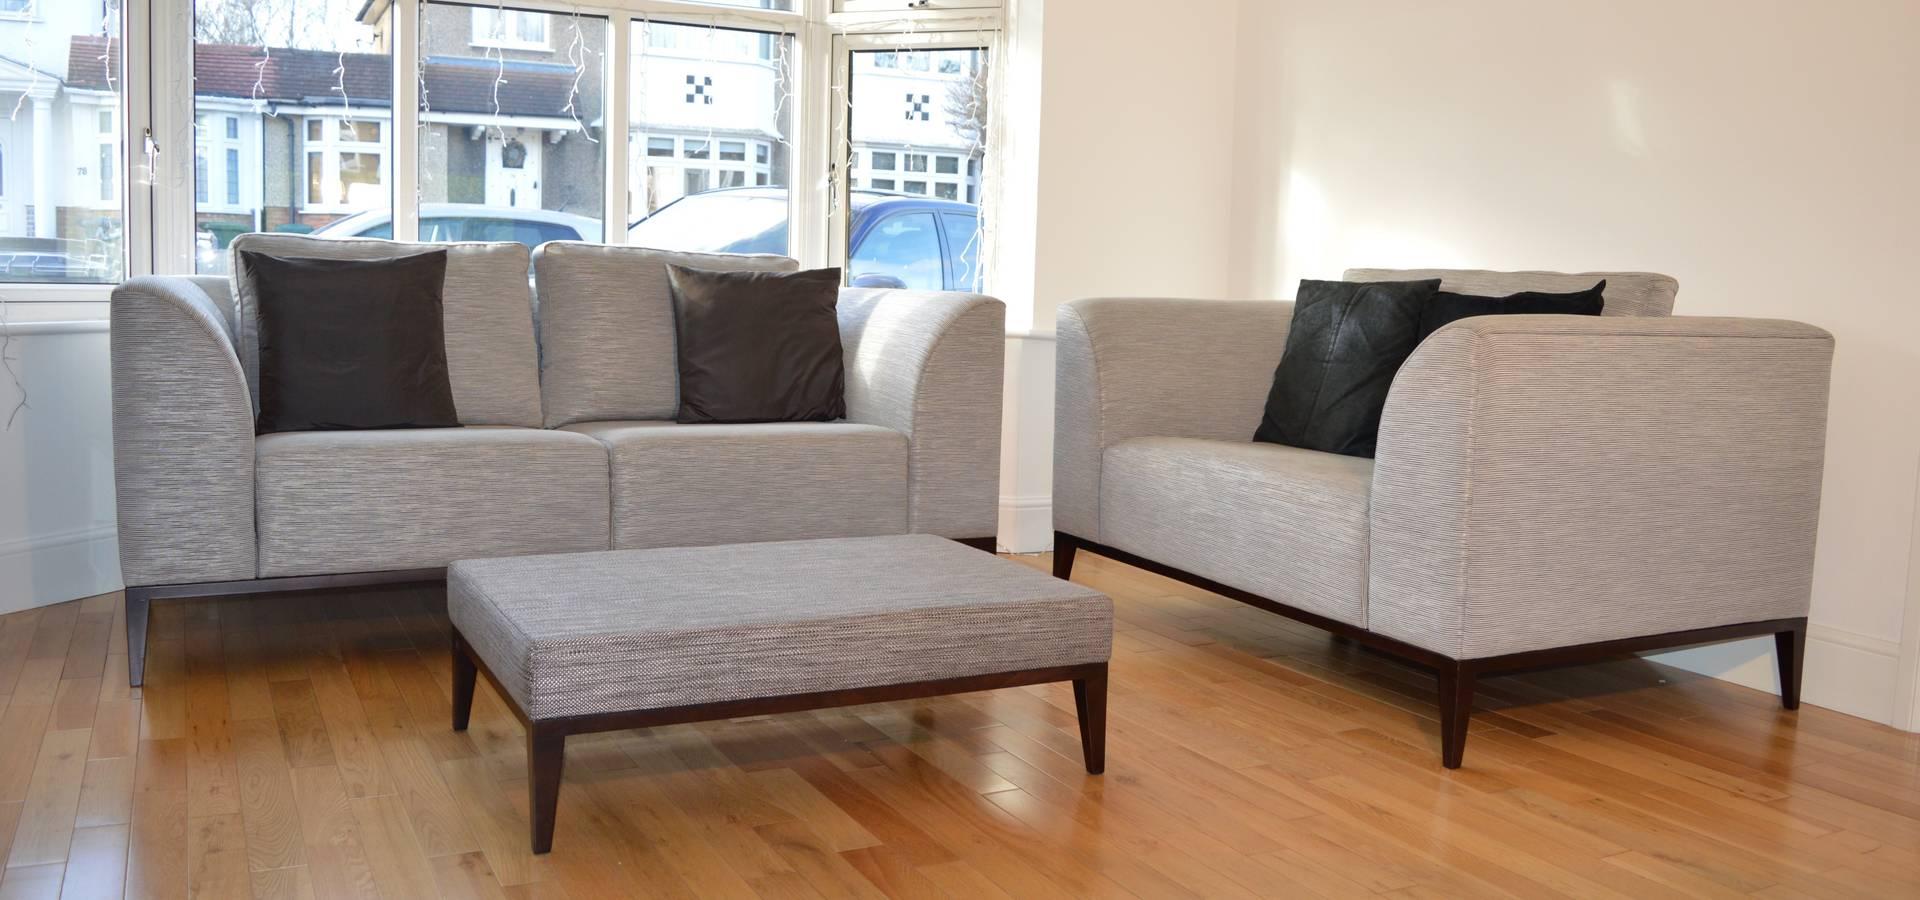 Chandler Upholstery